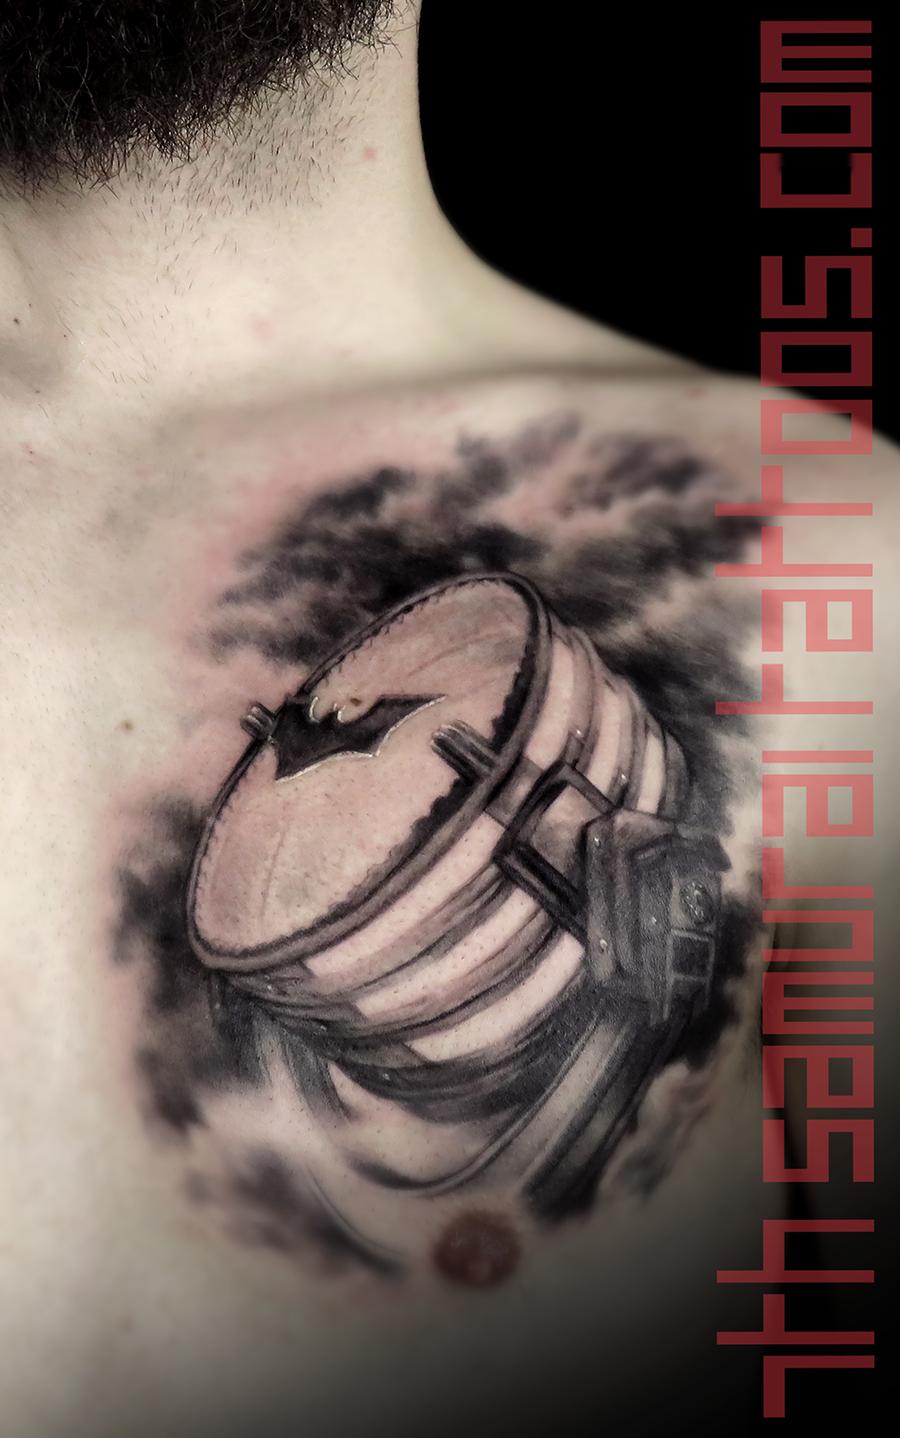 batman batsignal clouds geek geeky nerd nerdy comic book men's chest tattoo kai 7th samurai